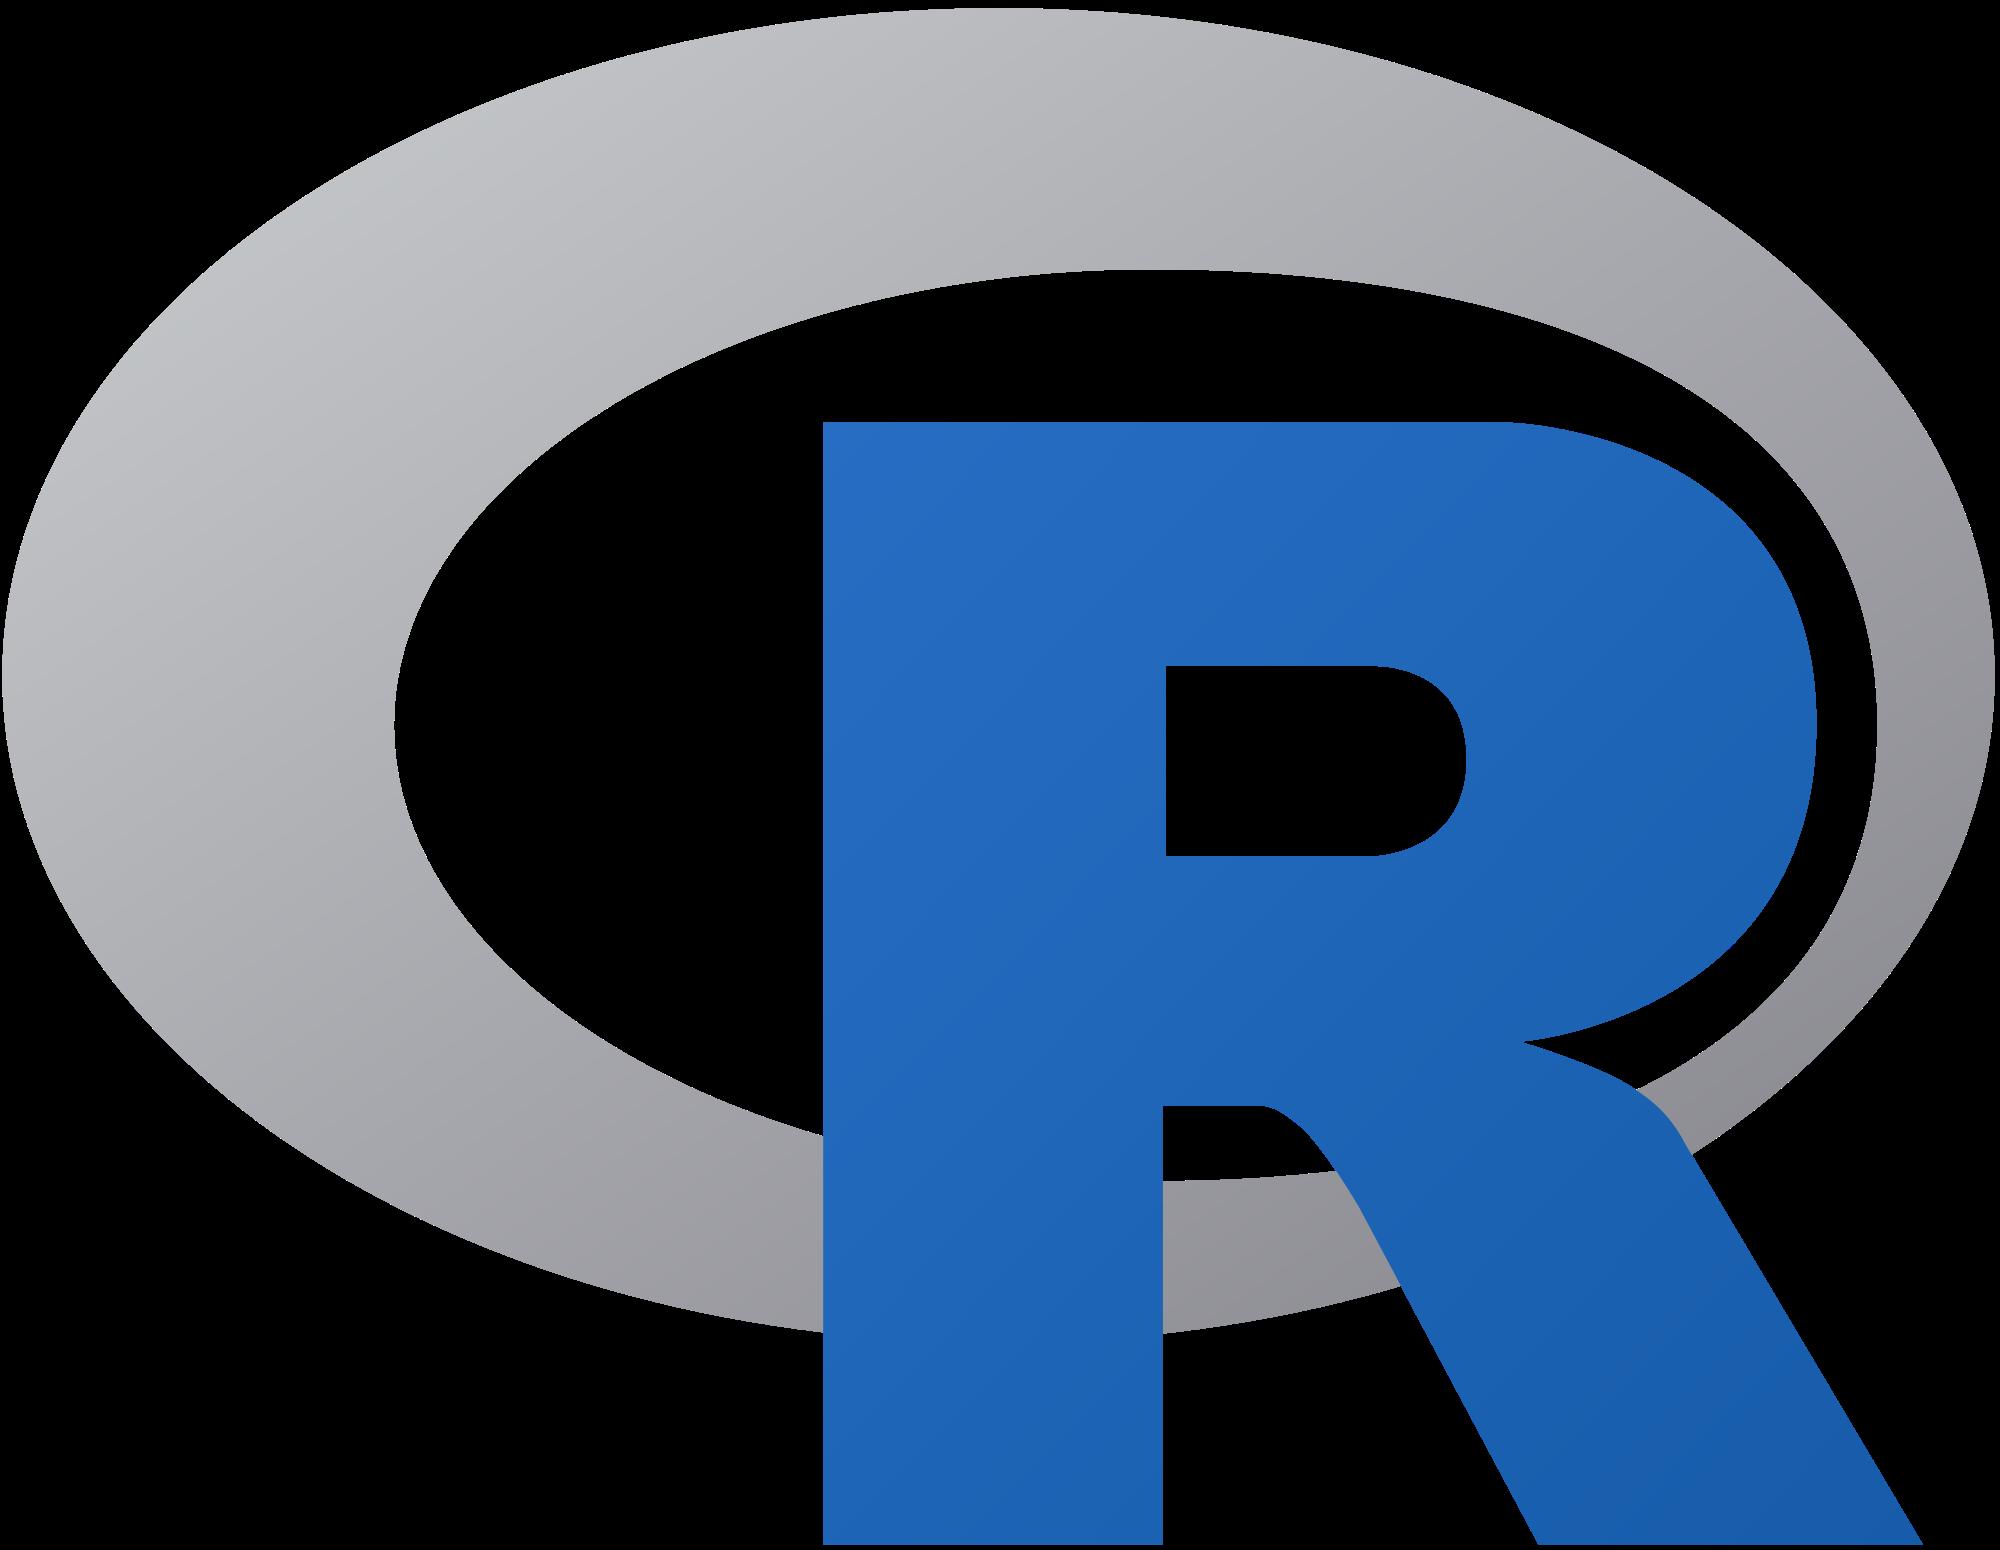 R programming language wikipedia. Statistics clipart data handling